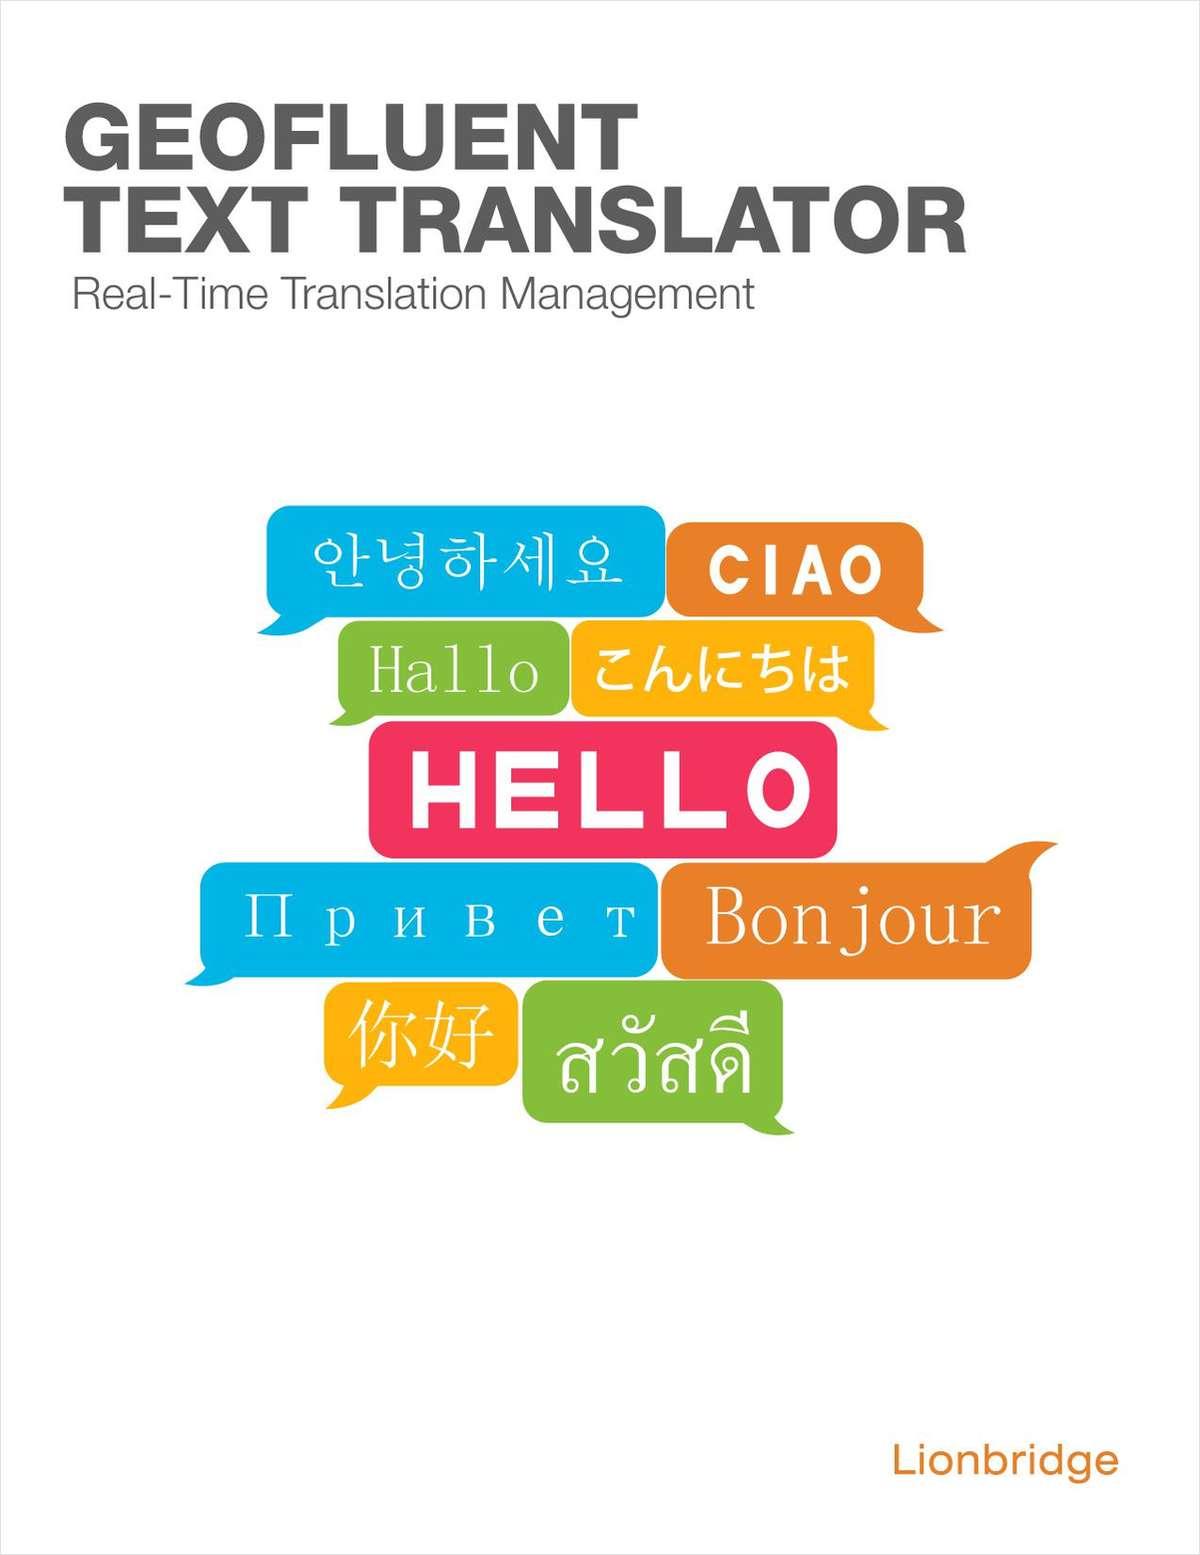 Real-Time Translation Management with GeoFluent Text Translator